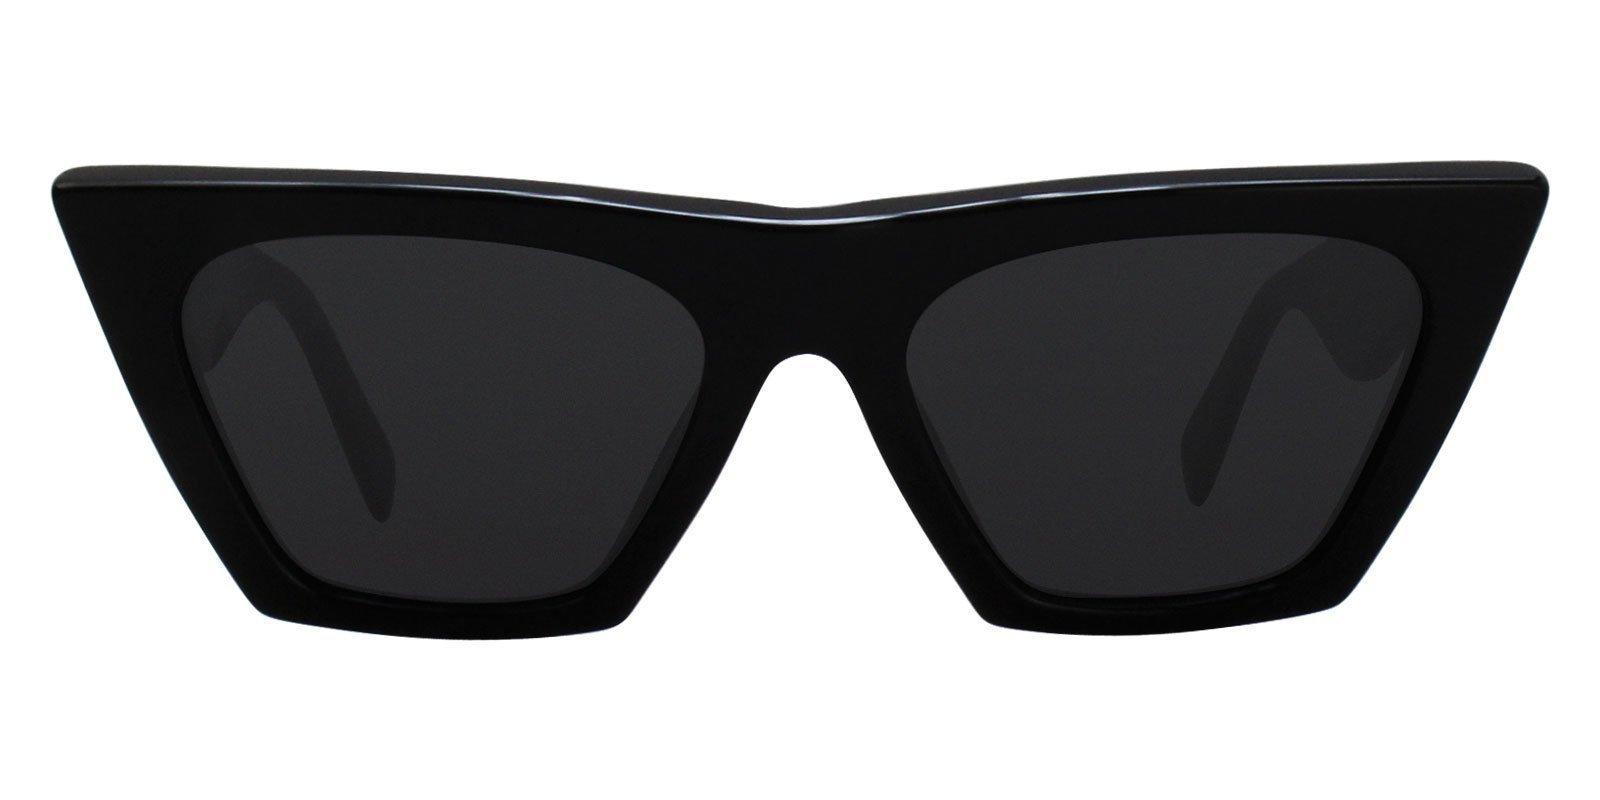 6ee6b4741ce Hailey Baldwin Wearing Celine CL41468 S Sunglasses– Designer Eyes